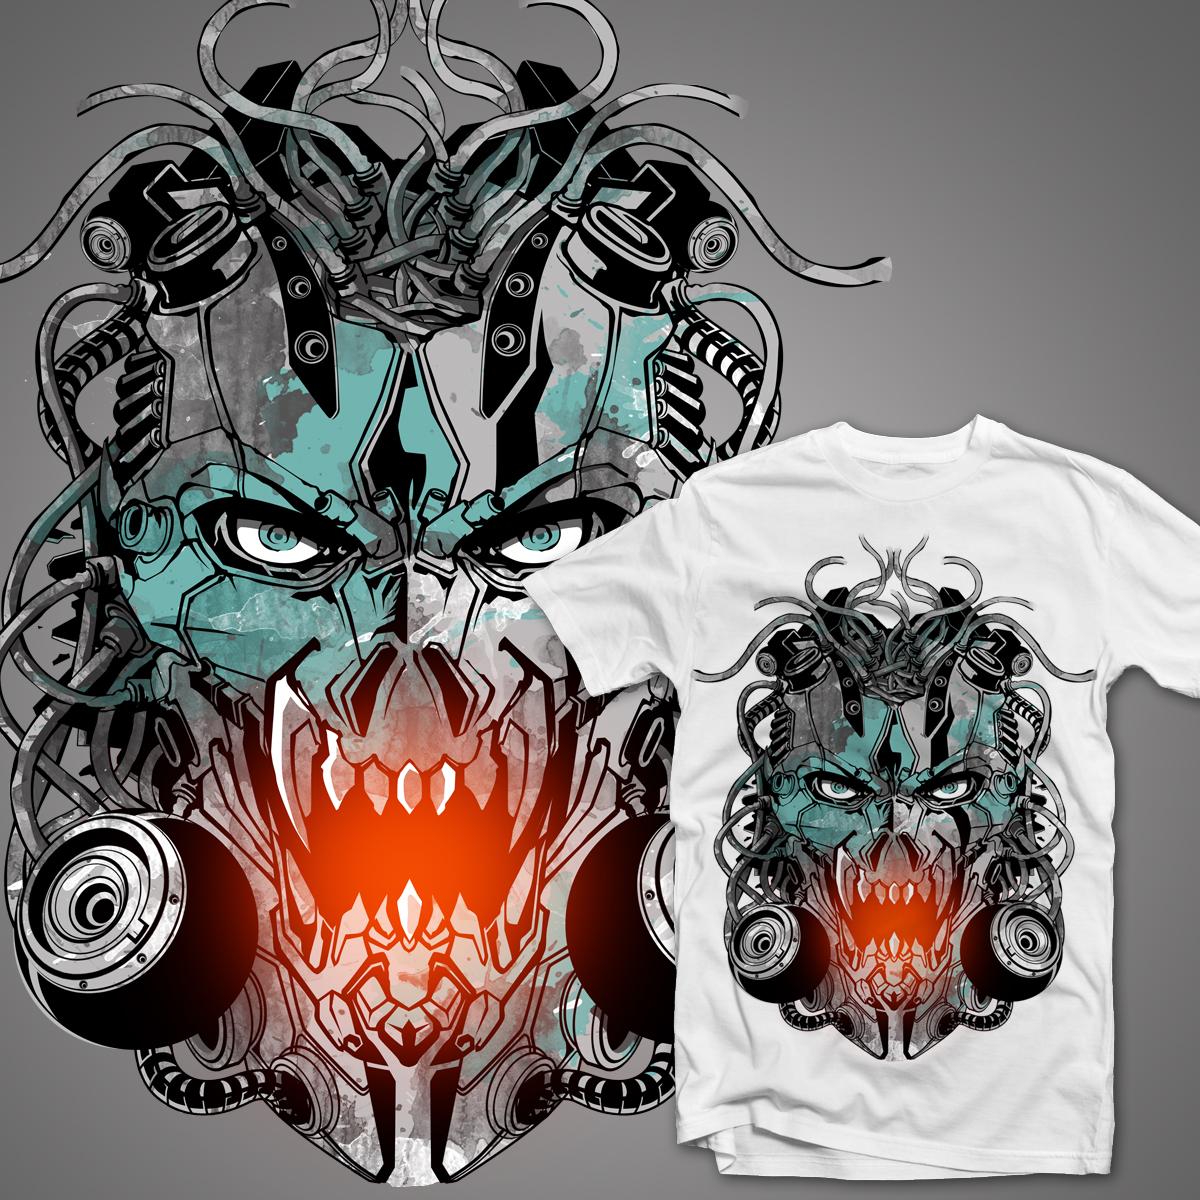 Cyborg Machine by alang_banyu on Threadless